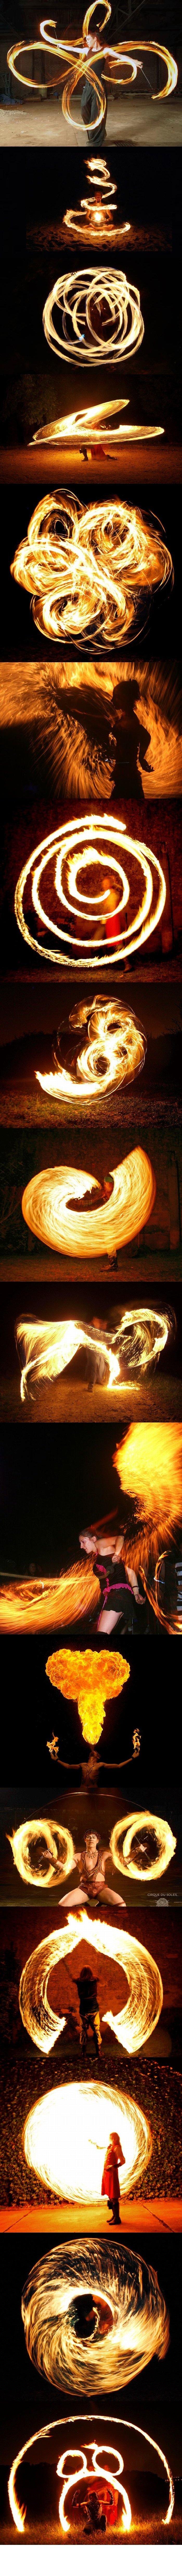 IRL Firebenders. Fire Bending level : Azula.. IRL waterbenders